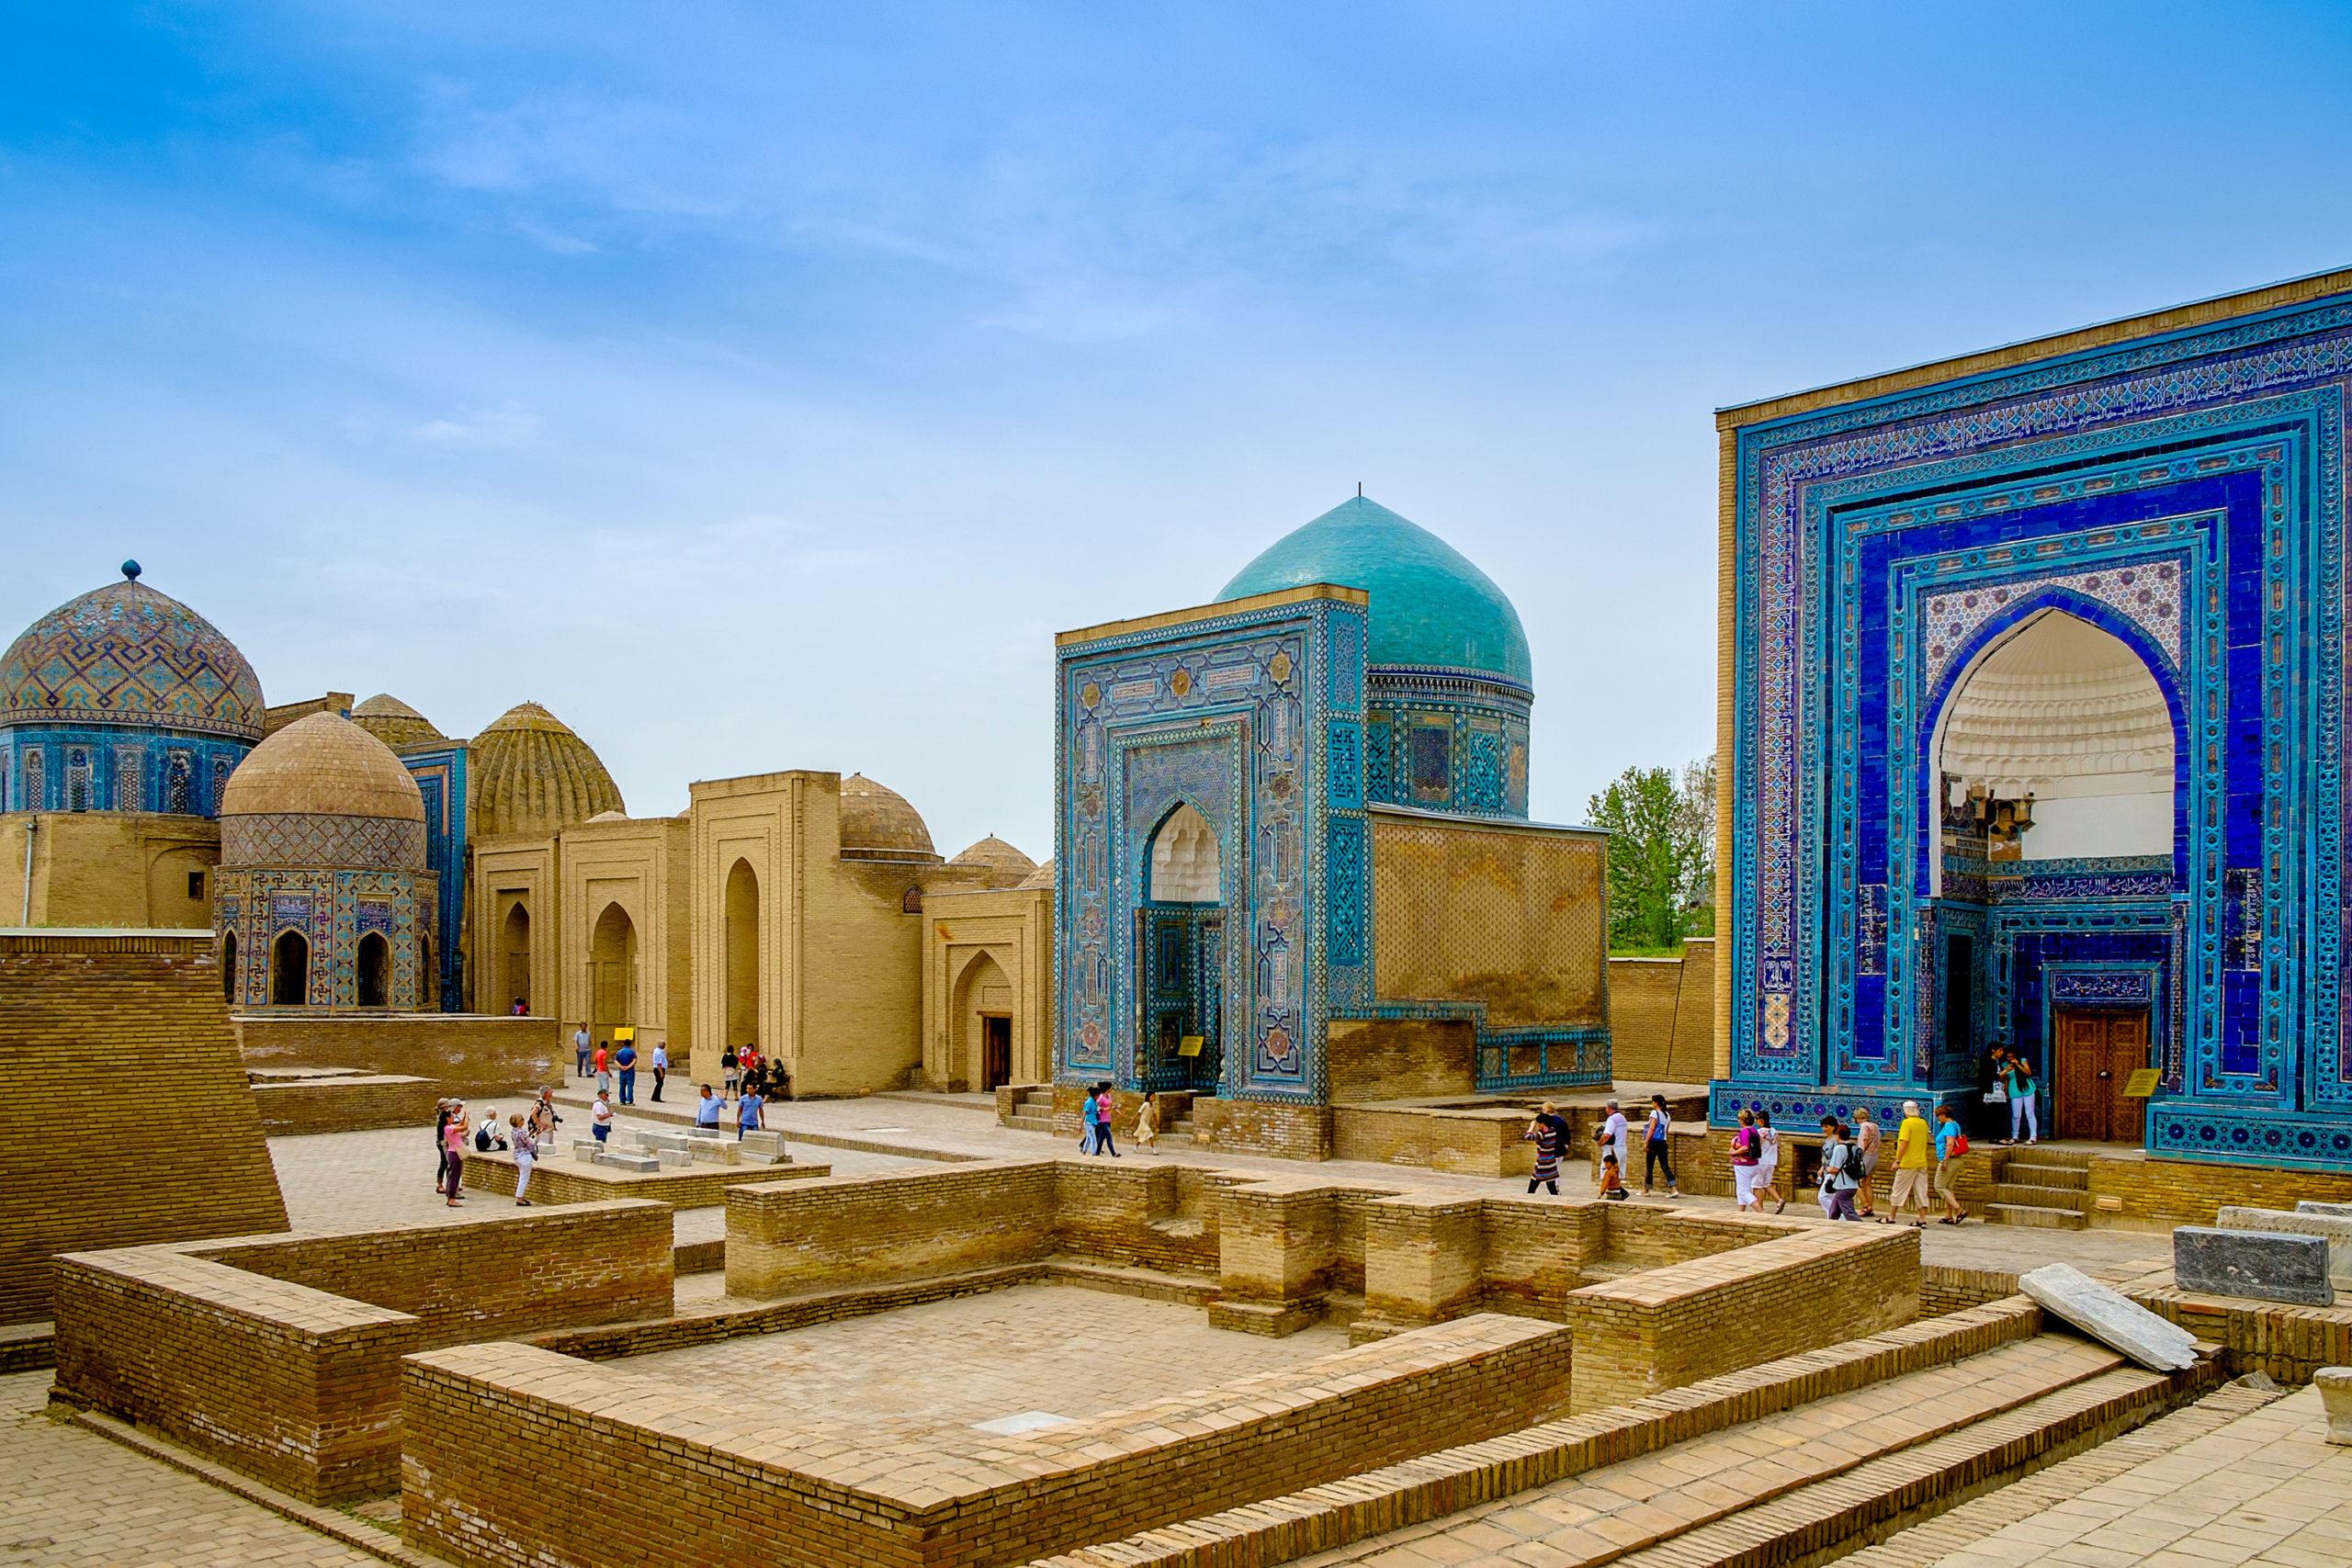 shutterstock_276155870_samarkand-uzbekistan-unesco